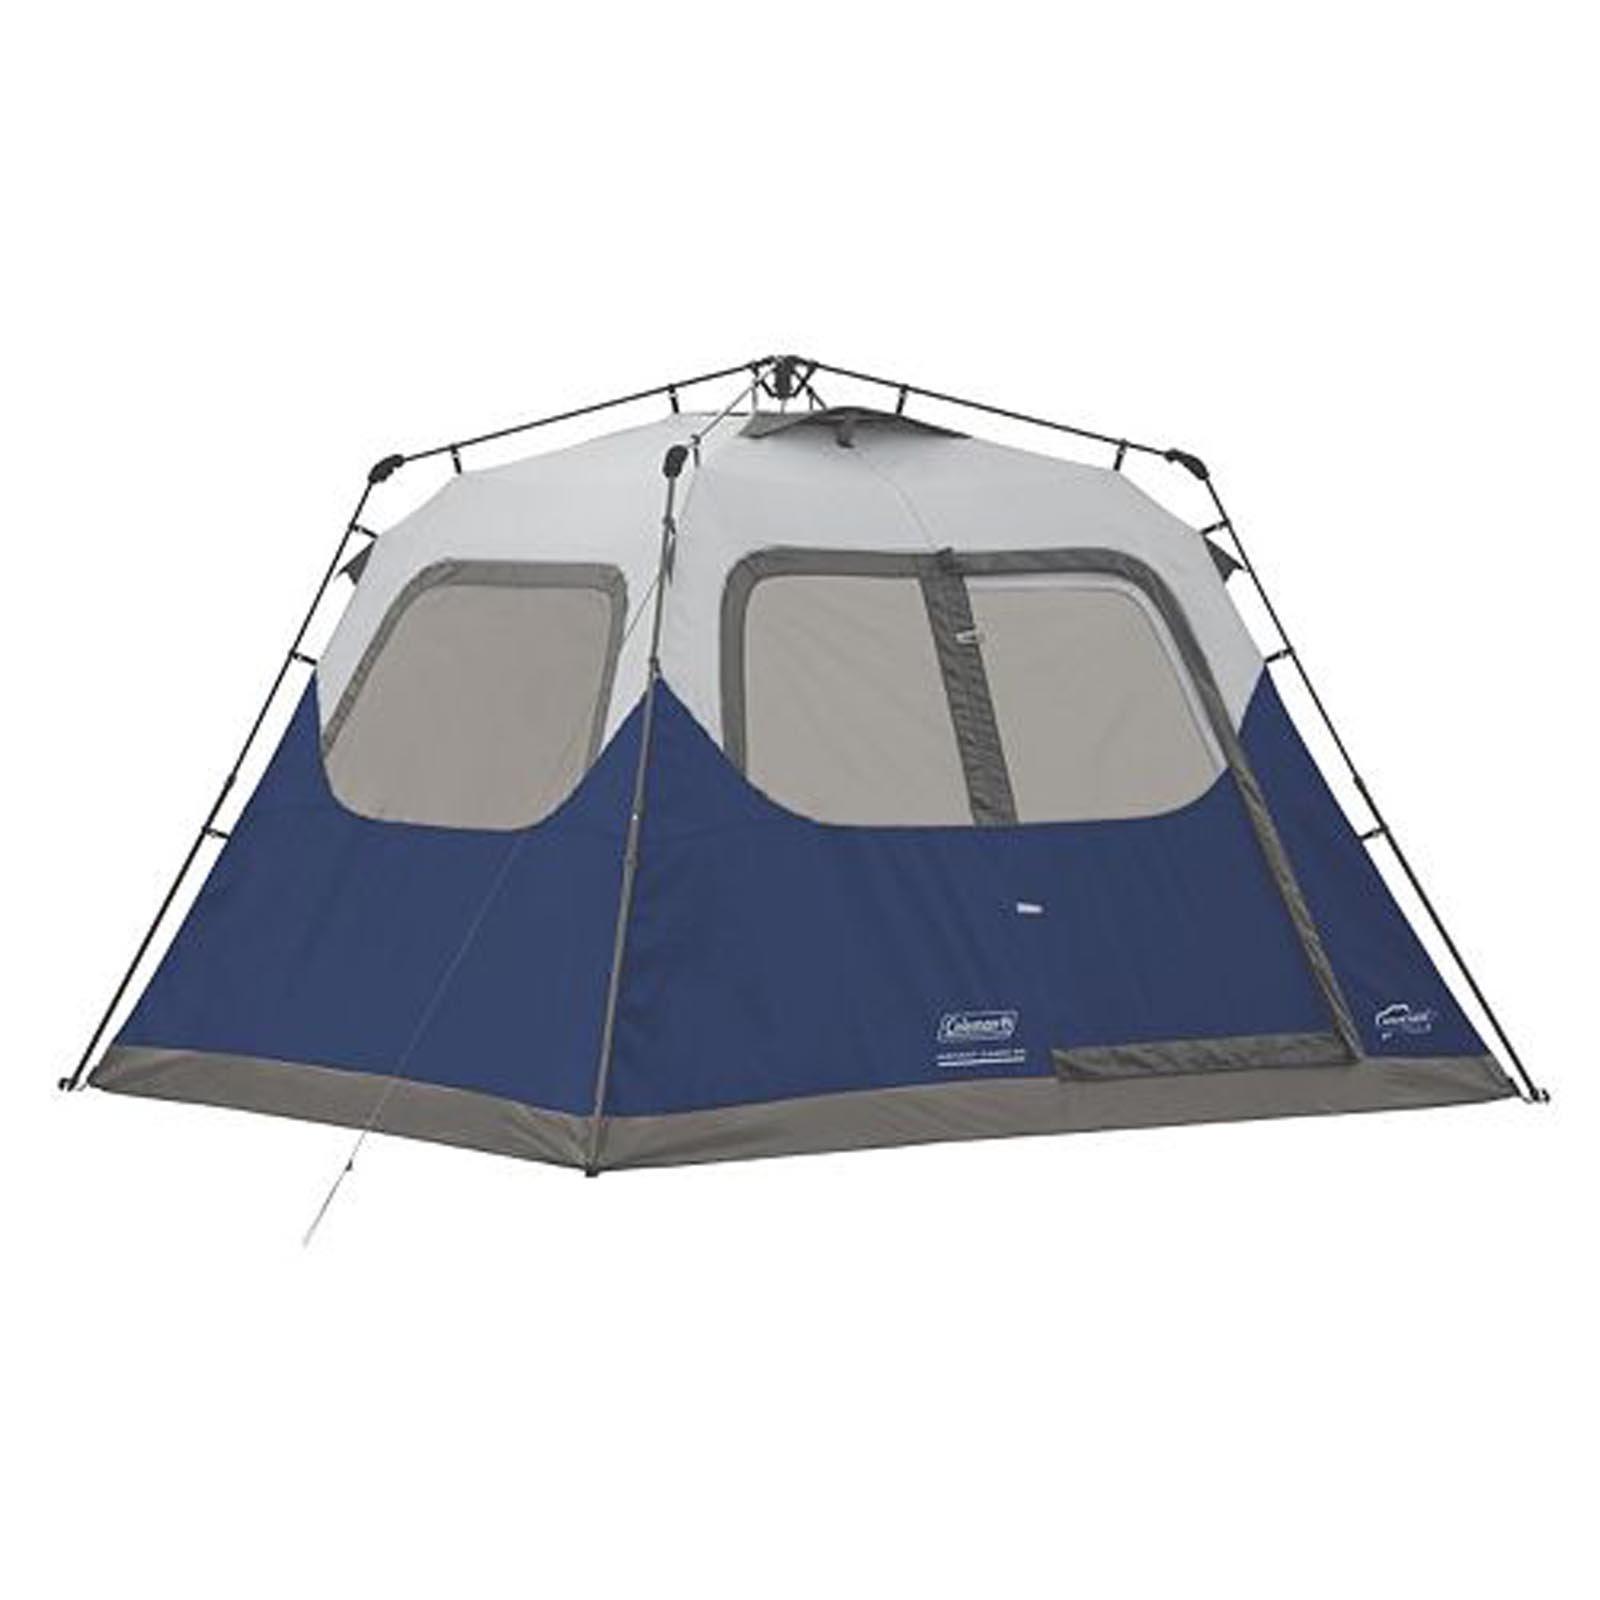 Coleman 6-Person Instant Tent Blue by Coleman (Image #1)